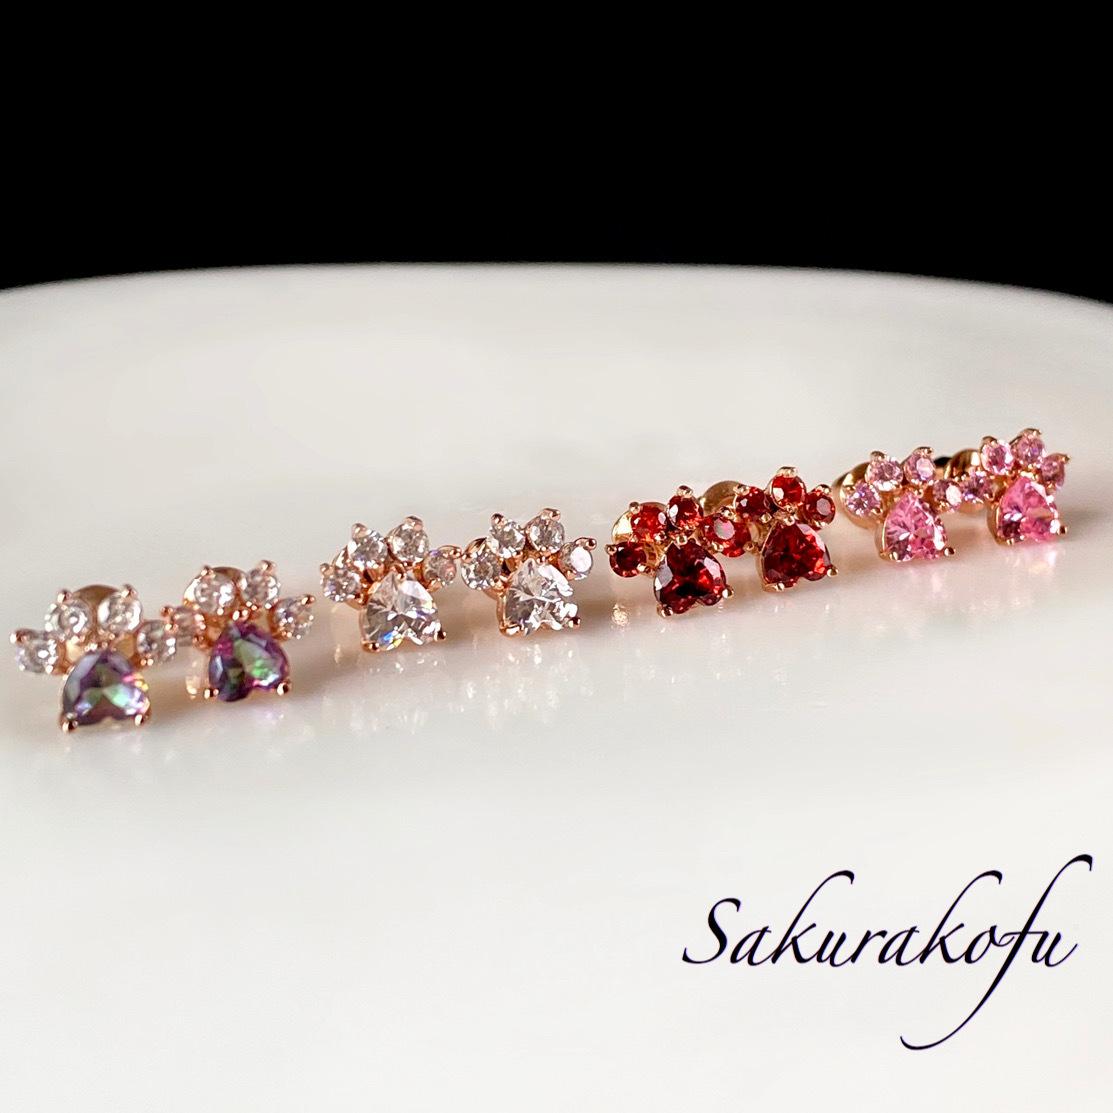 D044 NIKUKYU(dog's paw pads) stud pierced earrings(肉球 ピアス)